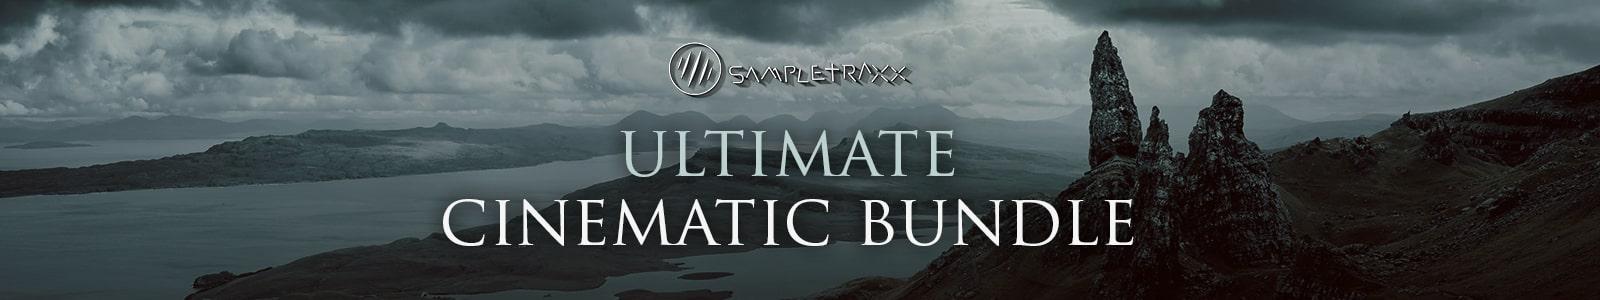 ultimate cinematic bundle